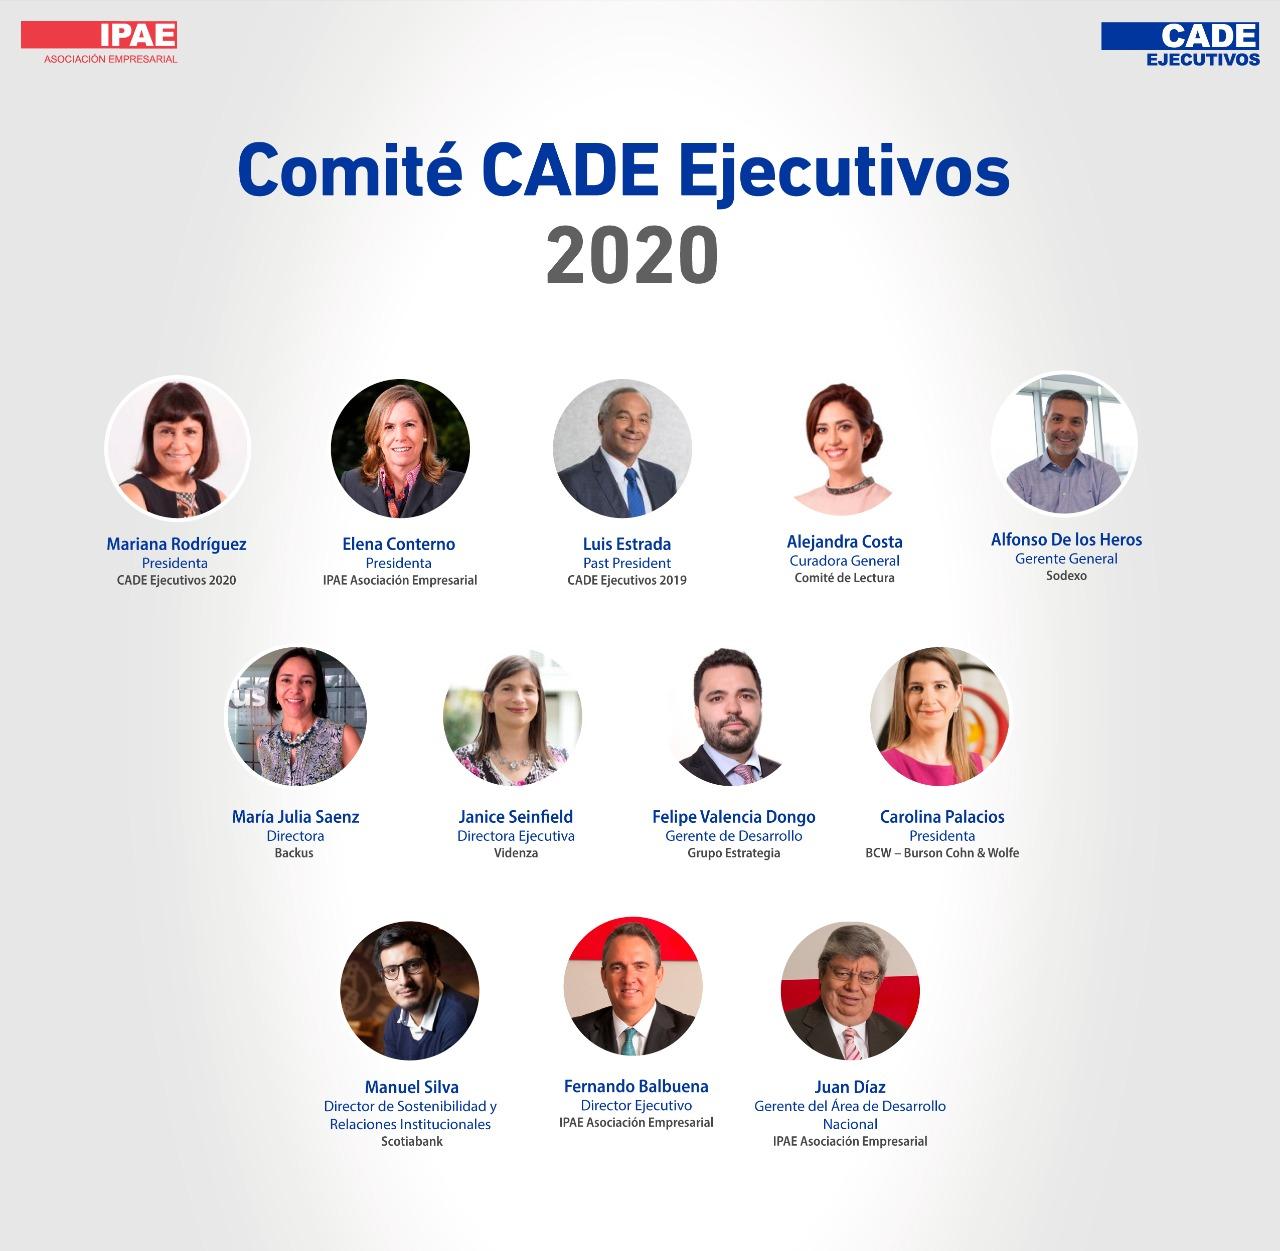 cade 2020